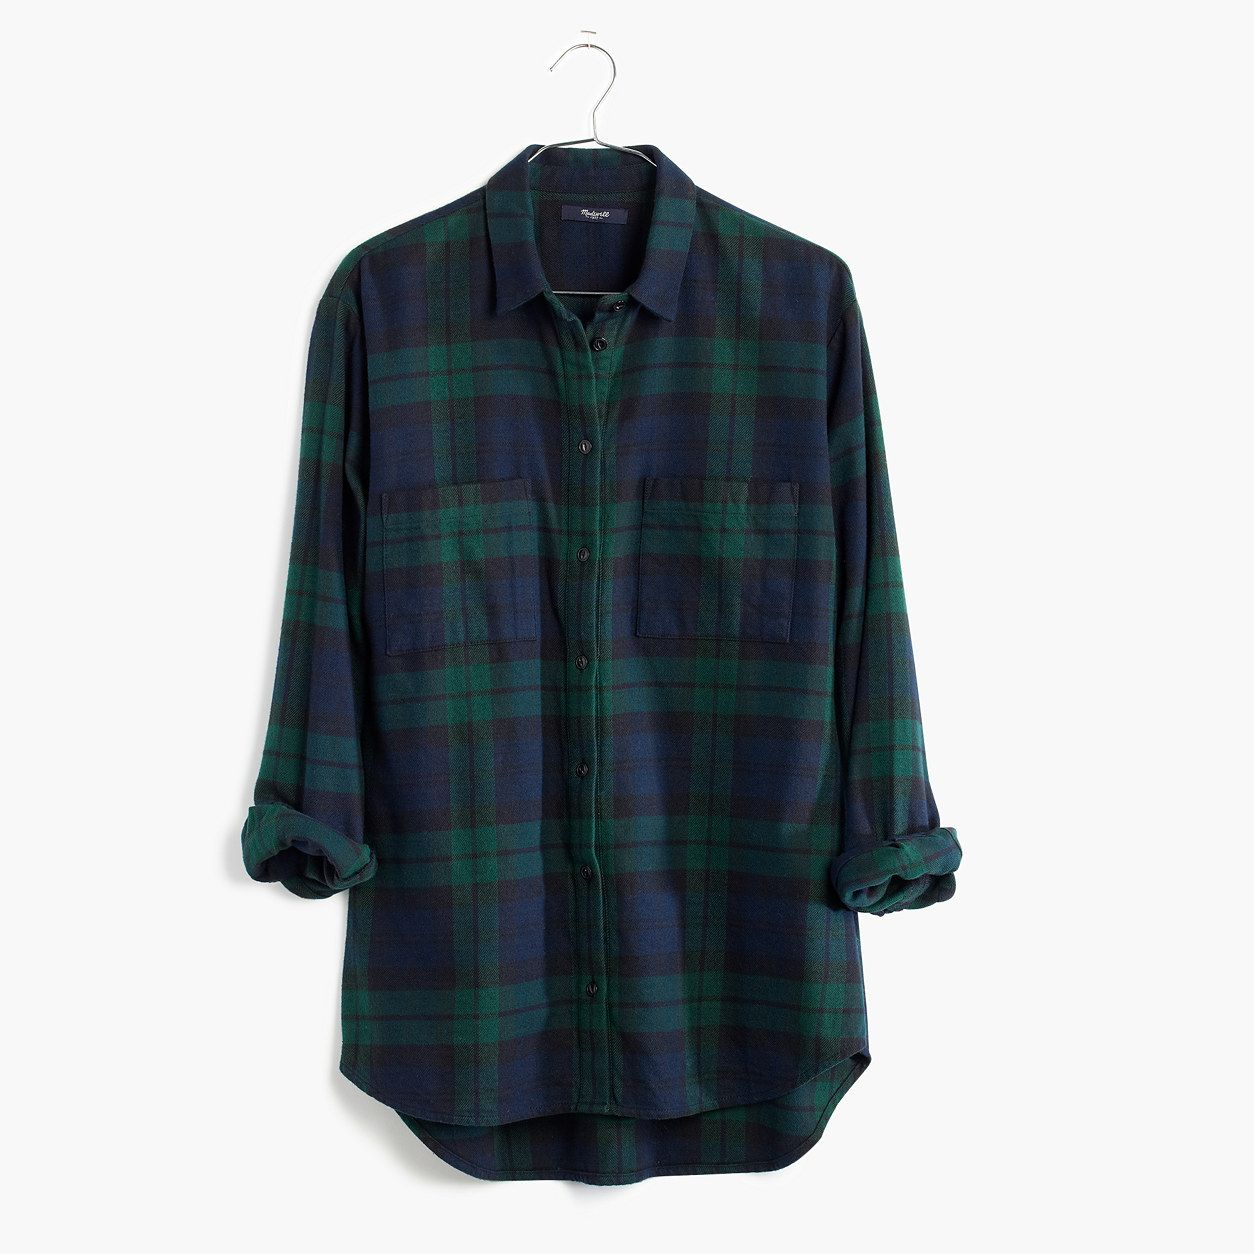 b355645ebcc Madewell Flannel Oversized Boyshirt In Dark Plaid